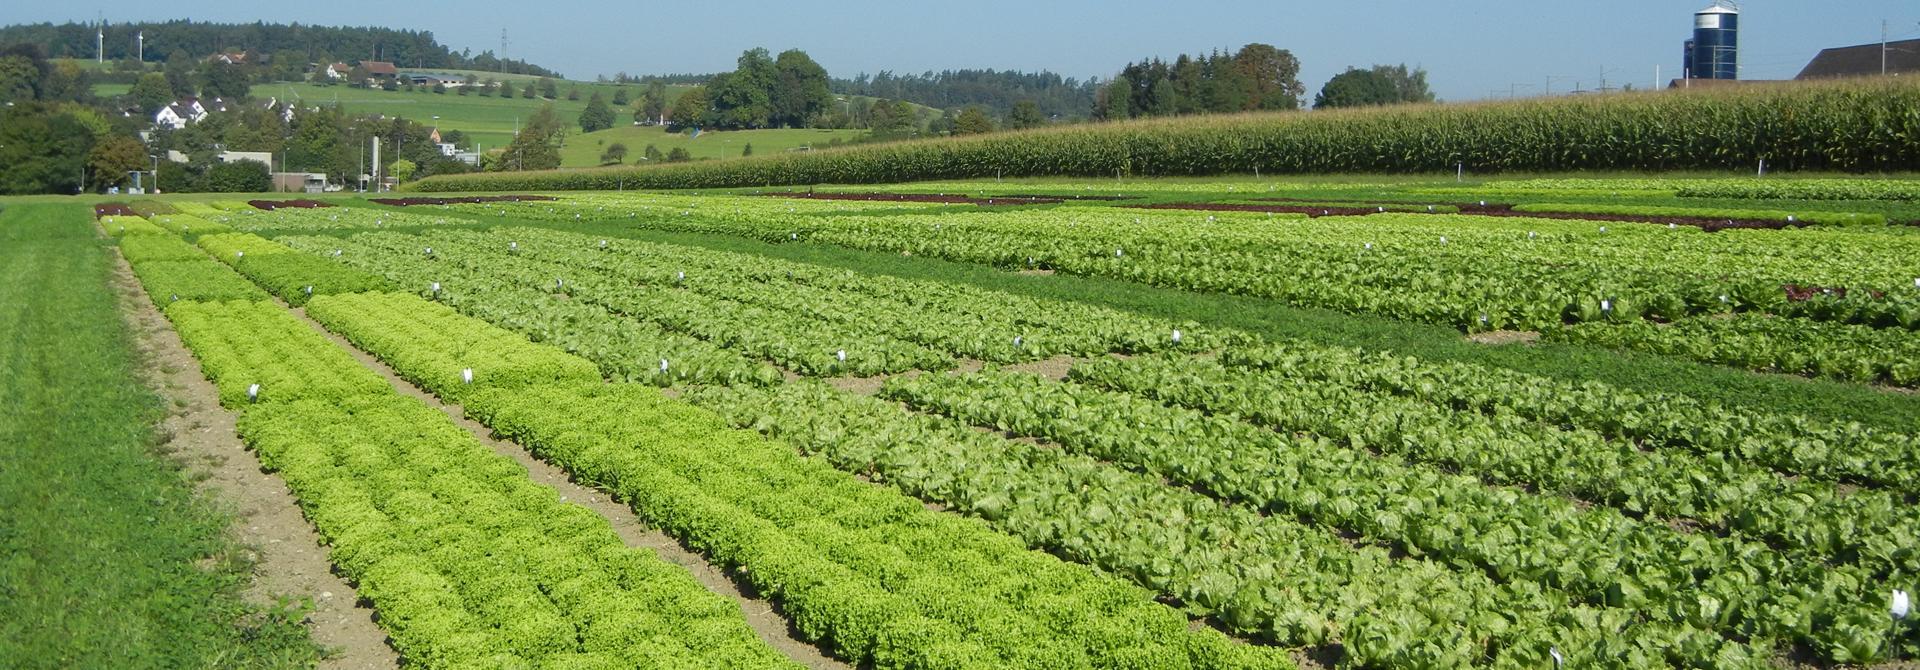 Salat-Sortenversuche am Salattag am Strickhof in Wu00fclflingen (2016)>